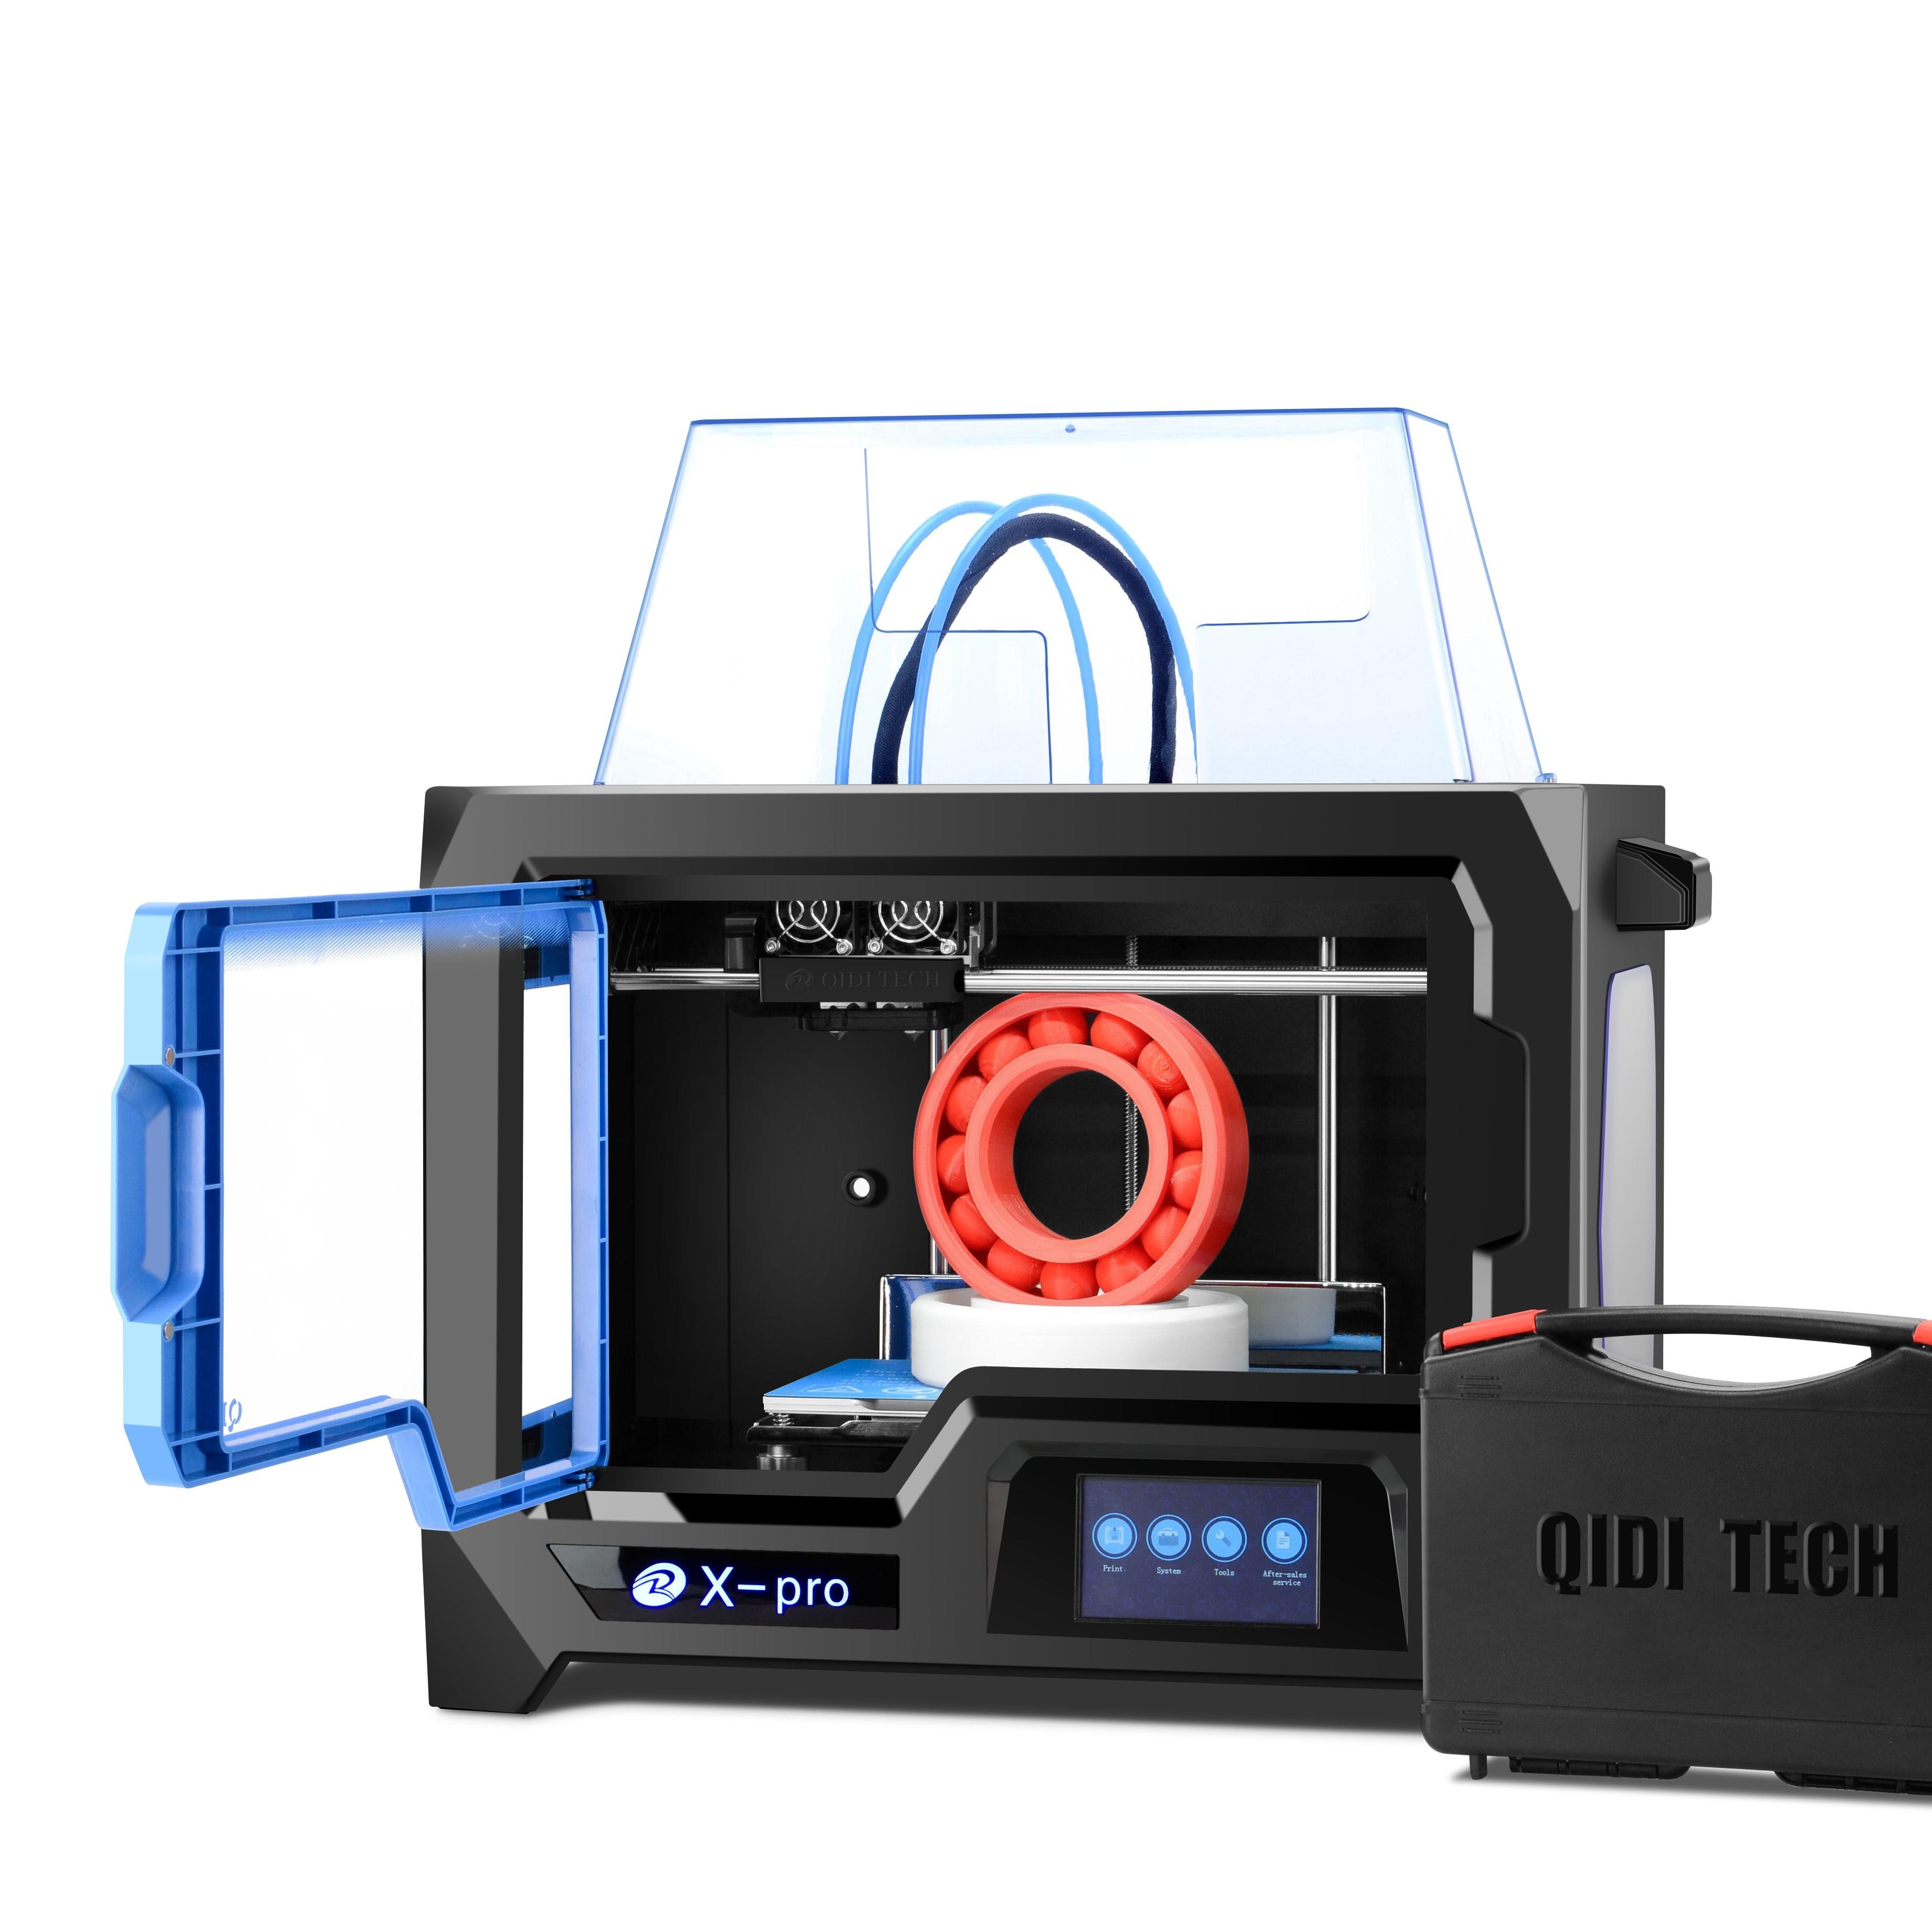 Qidi tecnologia 3d impressora dupla extrusora impressora 3d x-pro 4.3 Polegada tela de toque wifi/lan conexão 200*150*150mm abs e pla tpu